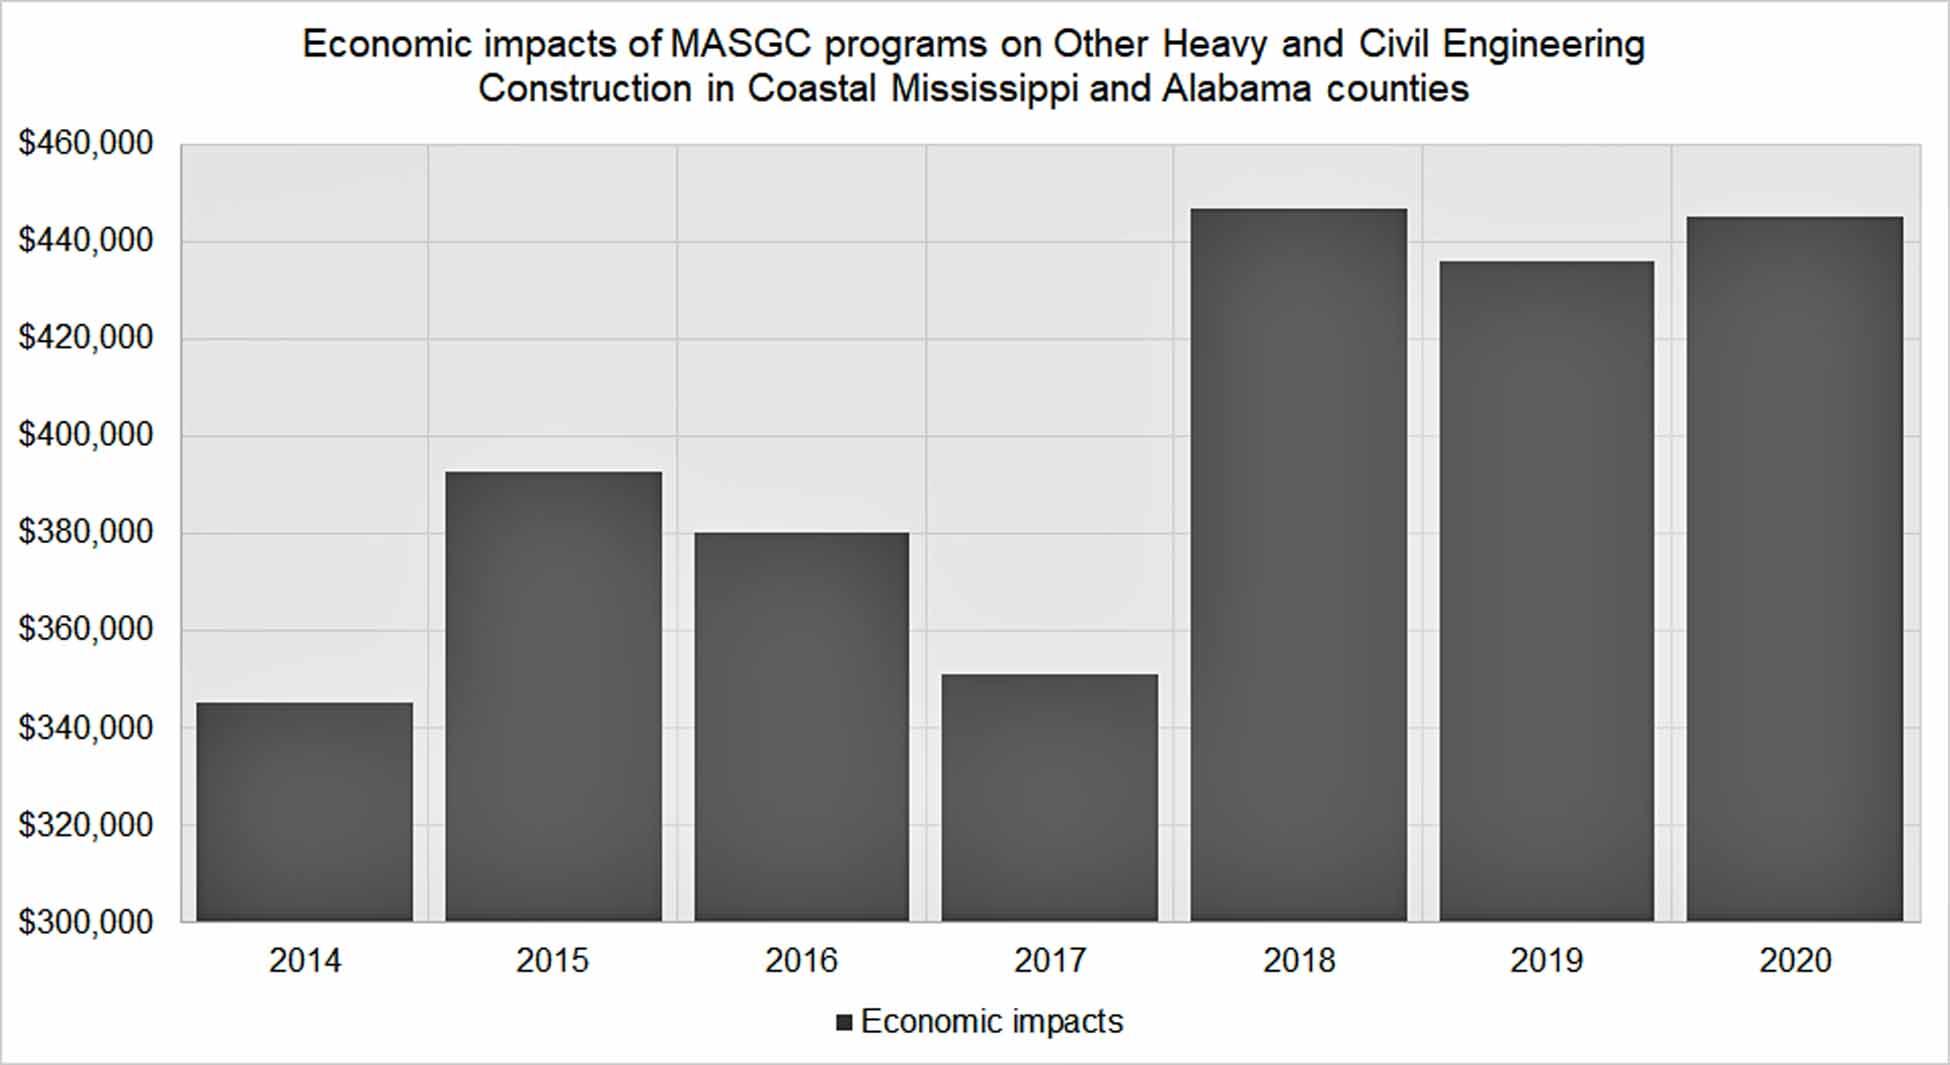 economic_impacts_of_masgc_programs_on_coastal_restoration_in_coastal_ms_and_al.jpg